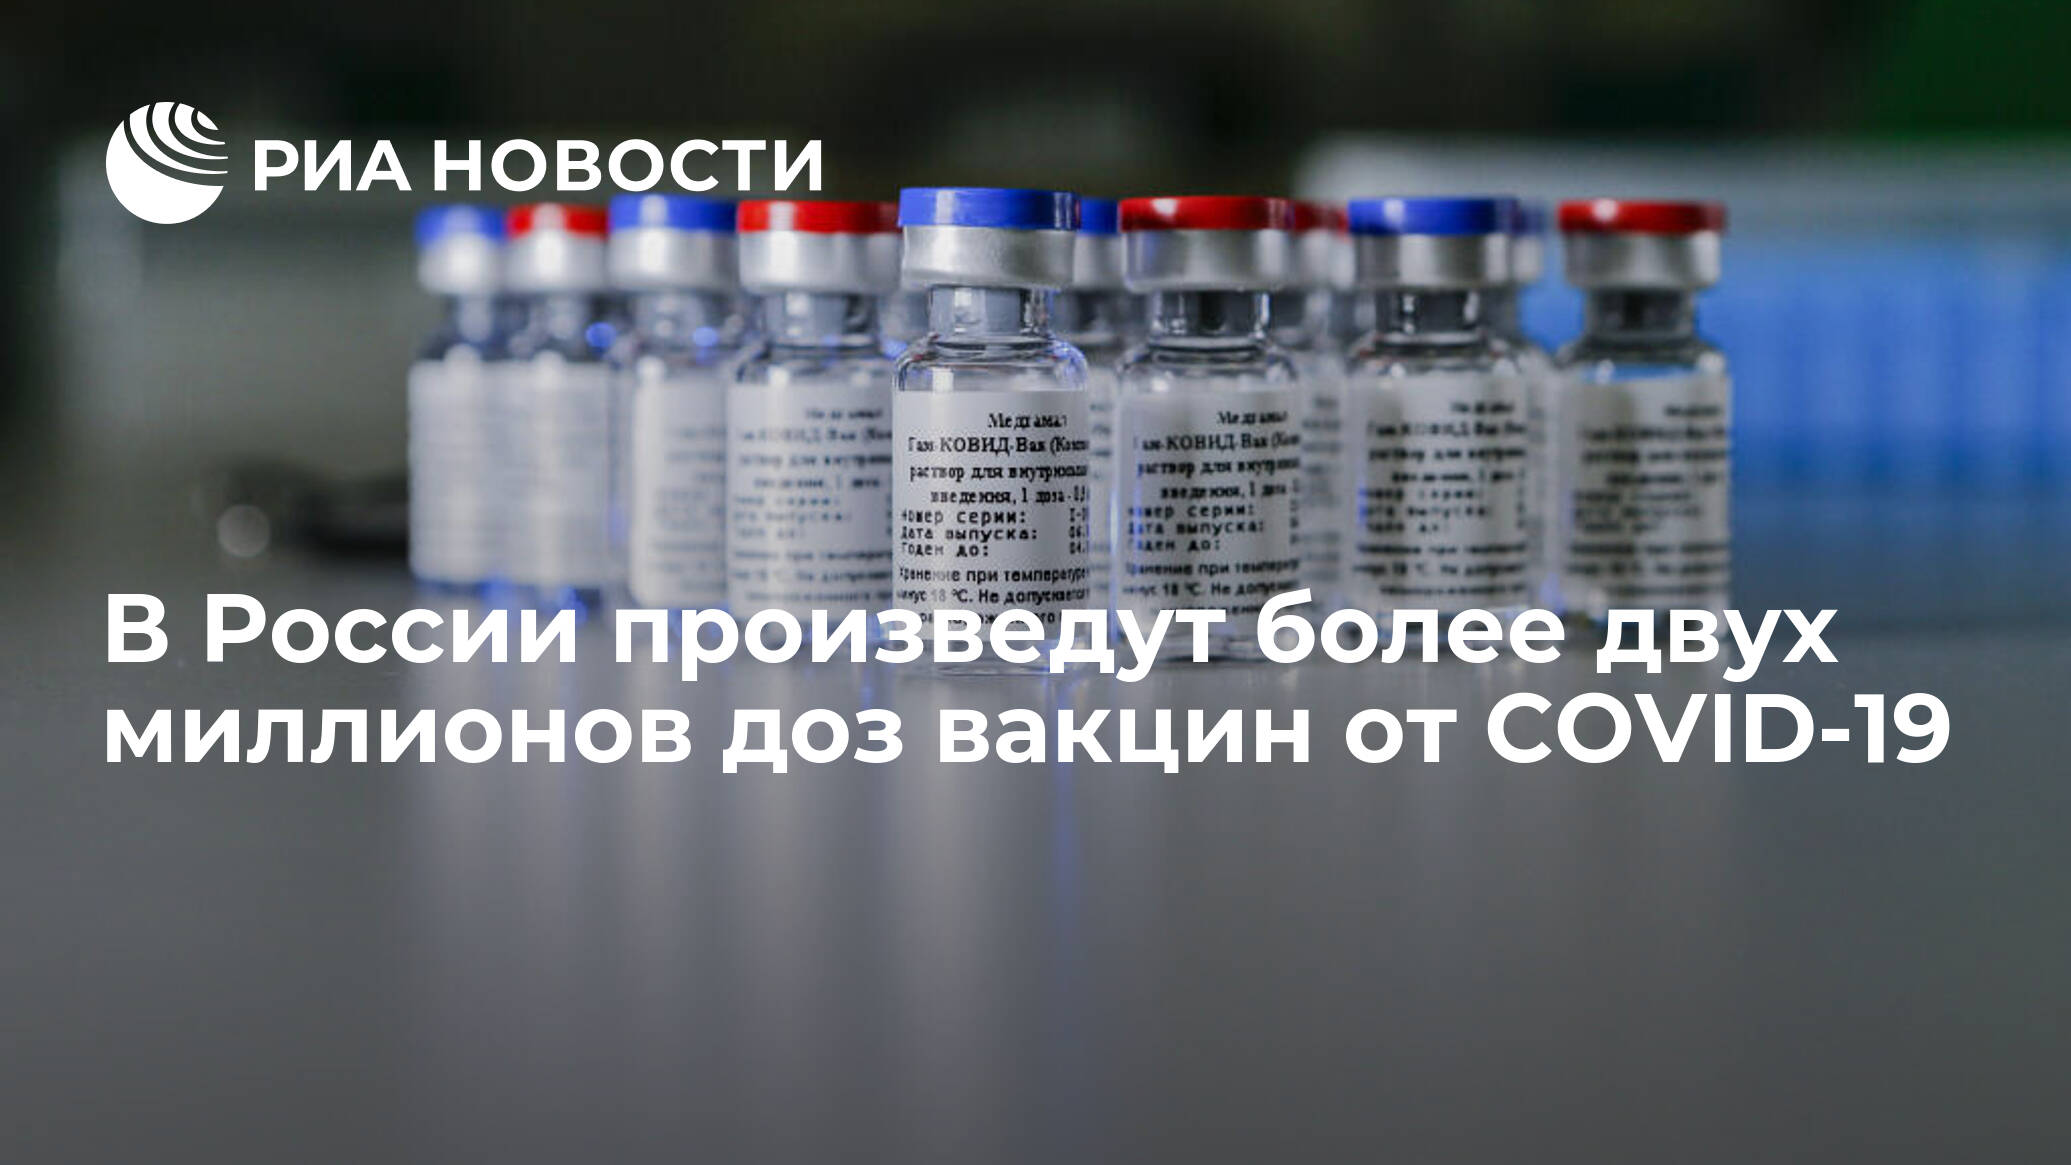 https://cdn25.img.ria.ru/images/sharing/article/1587380140.jpg?15840721461606917274